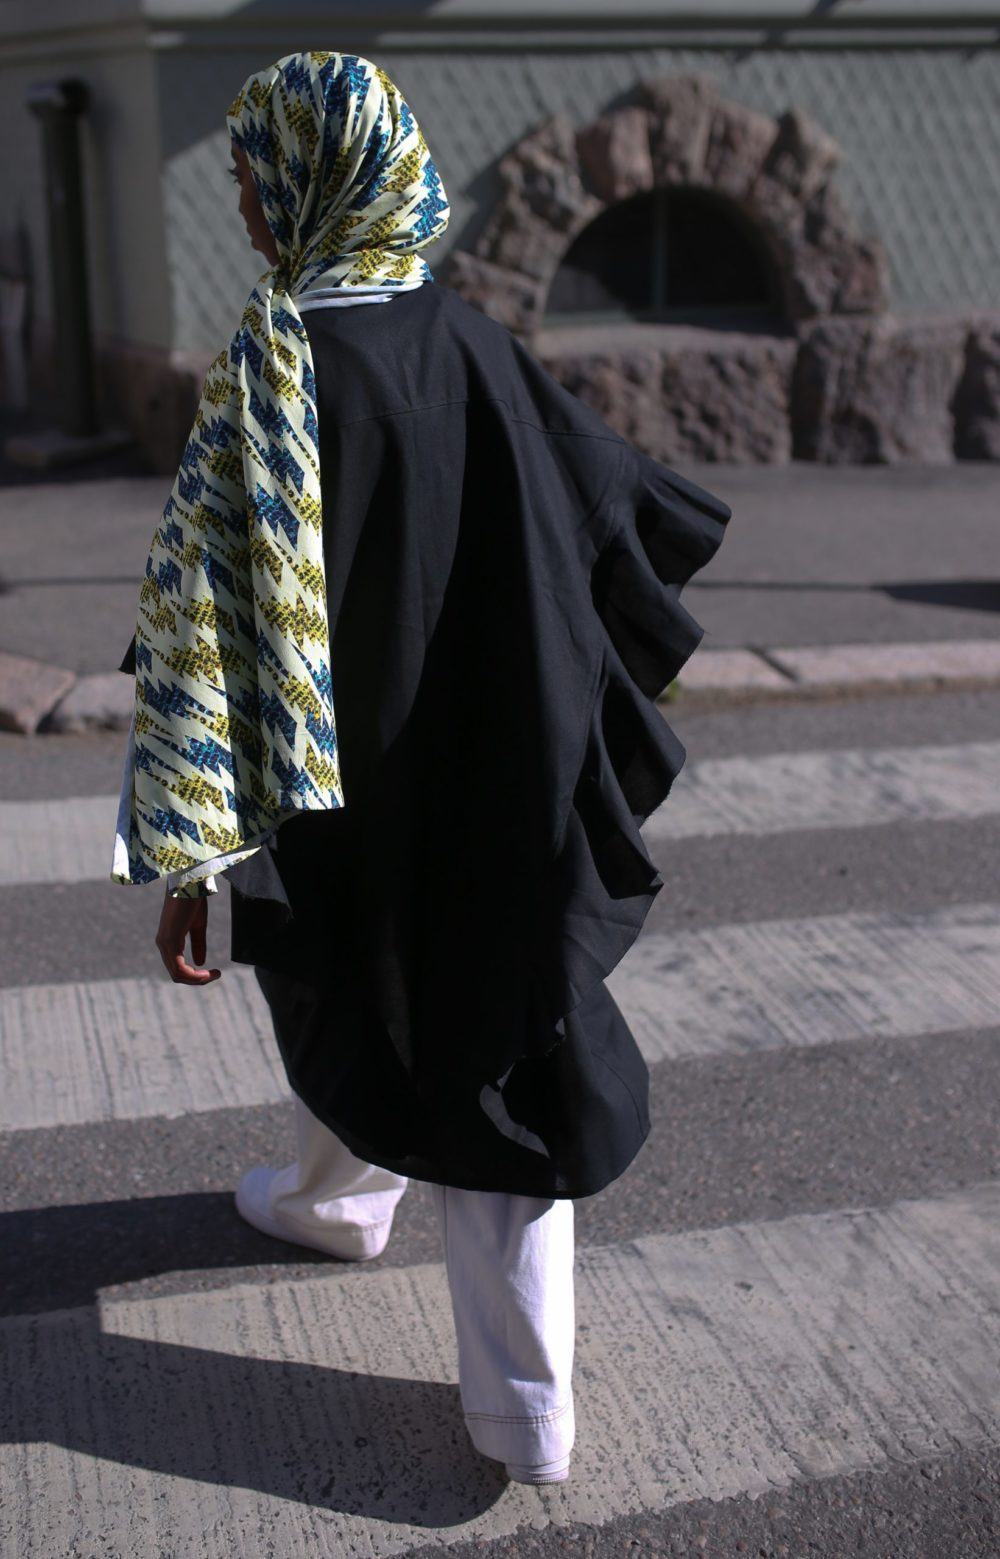 Vimma Polo neck dress KARLA Neilikat colorful S-M - colorful, KARLA, Neilikat, Polo neck dress, S-M